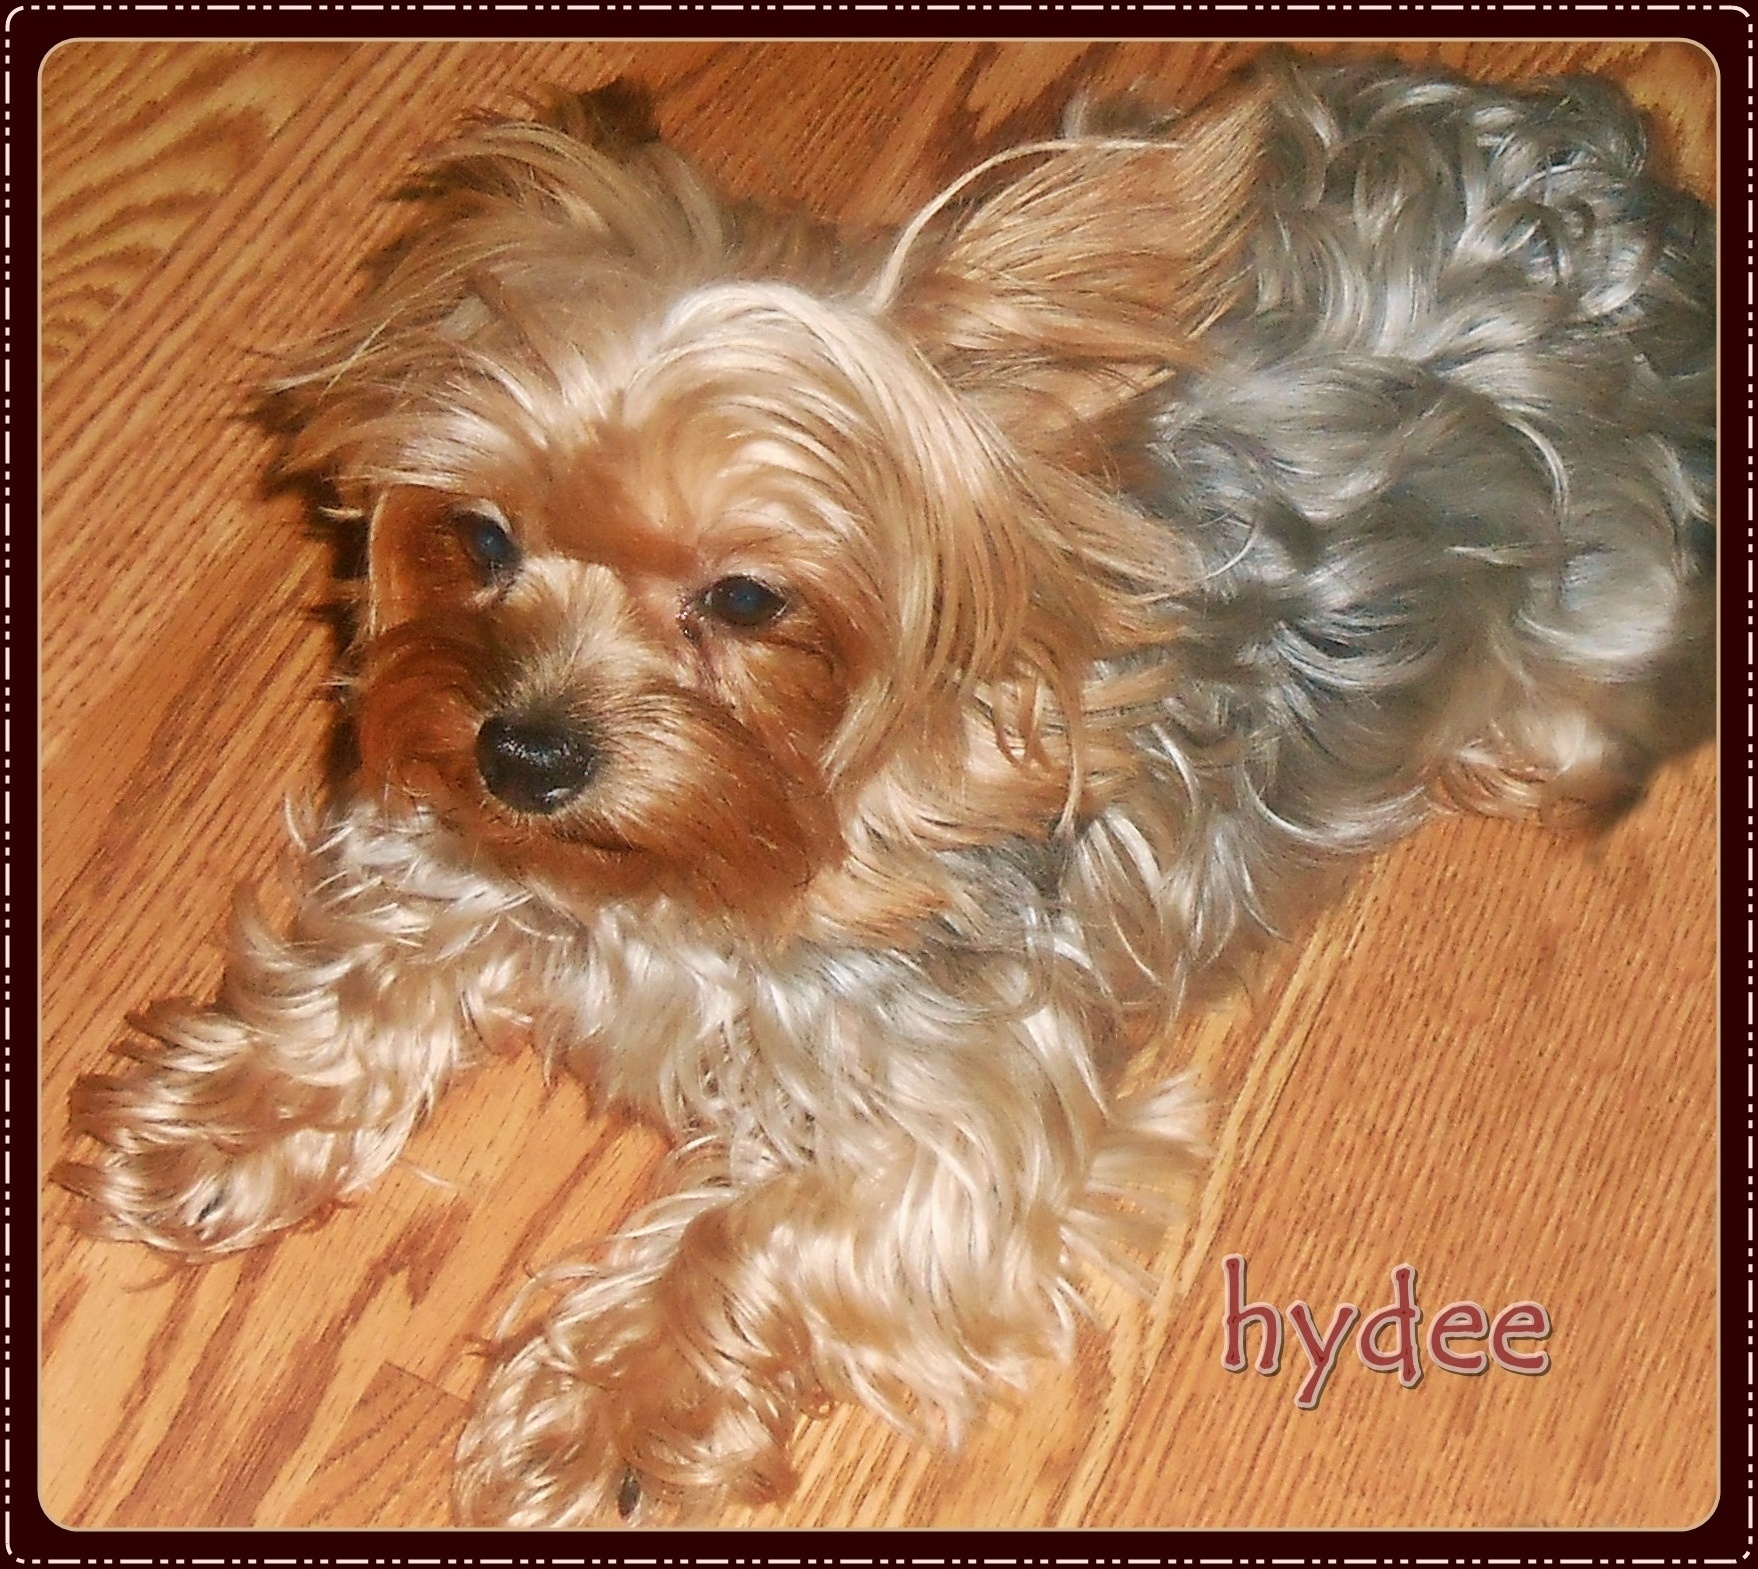 Hydee